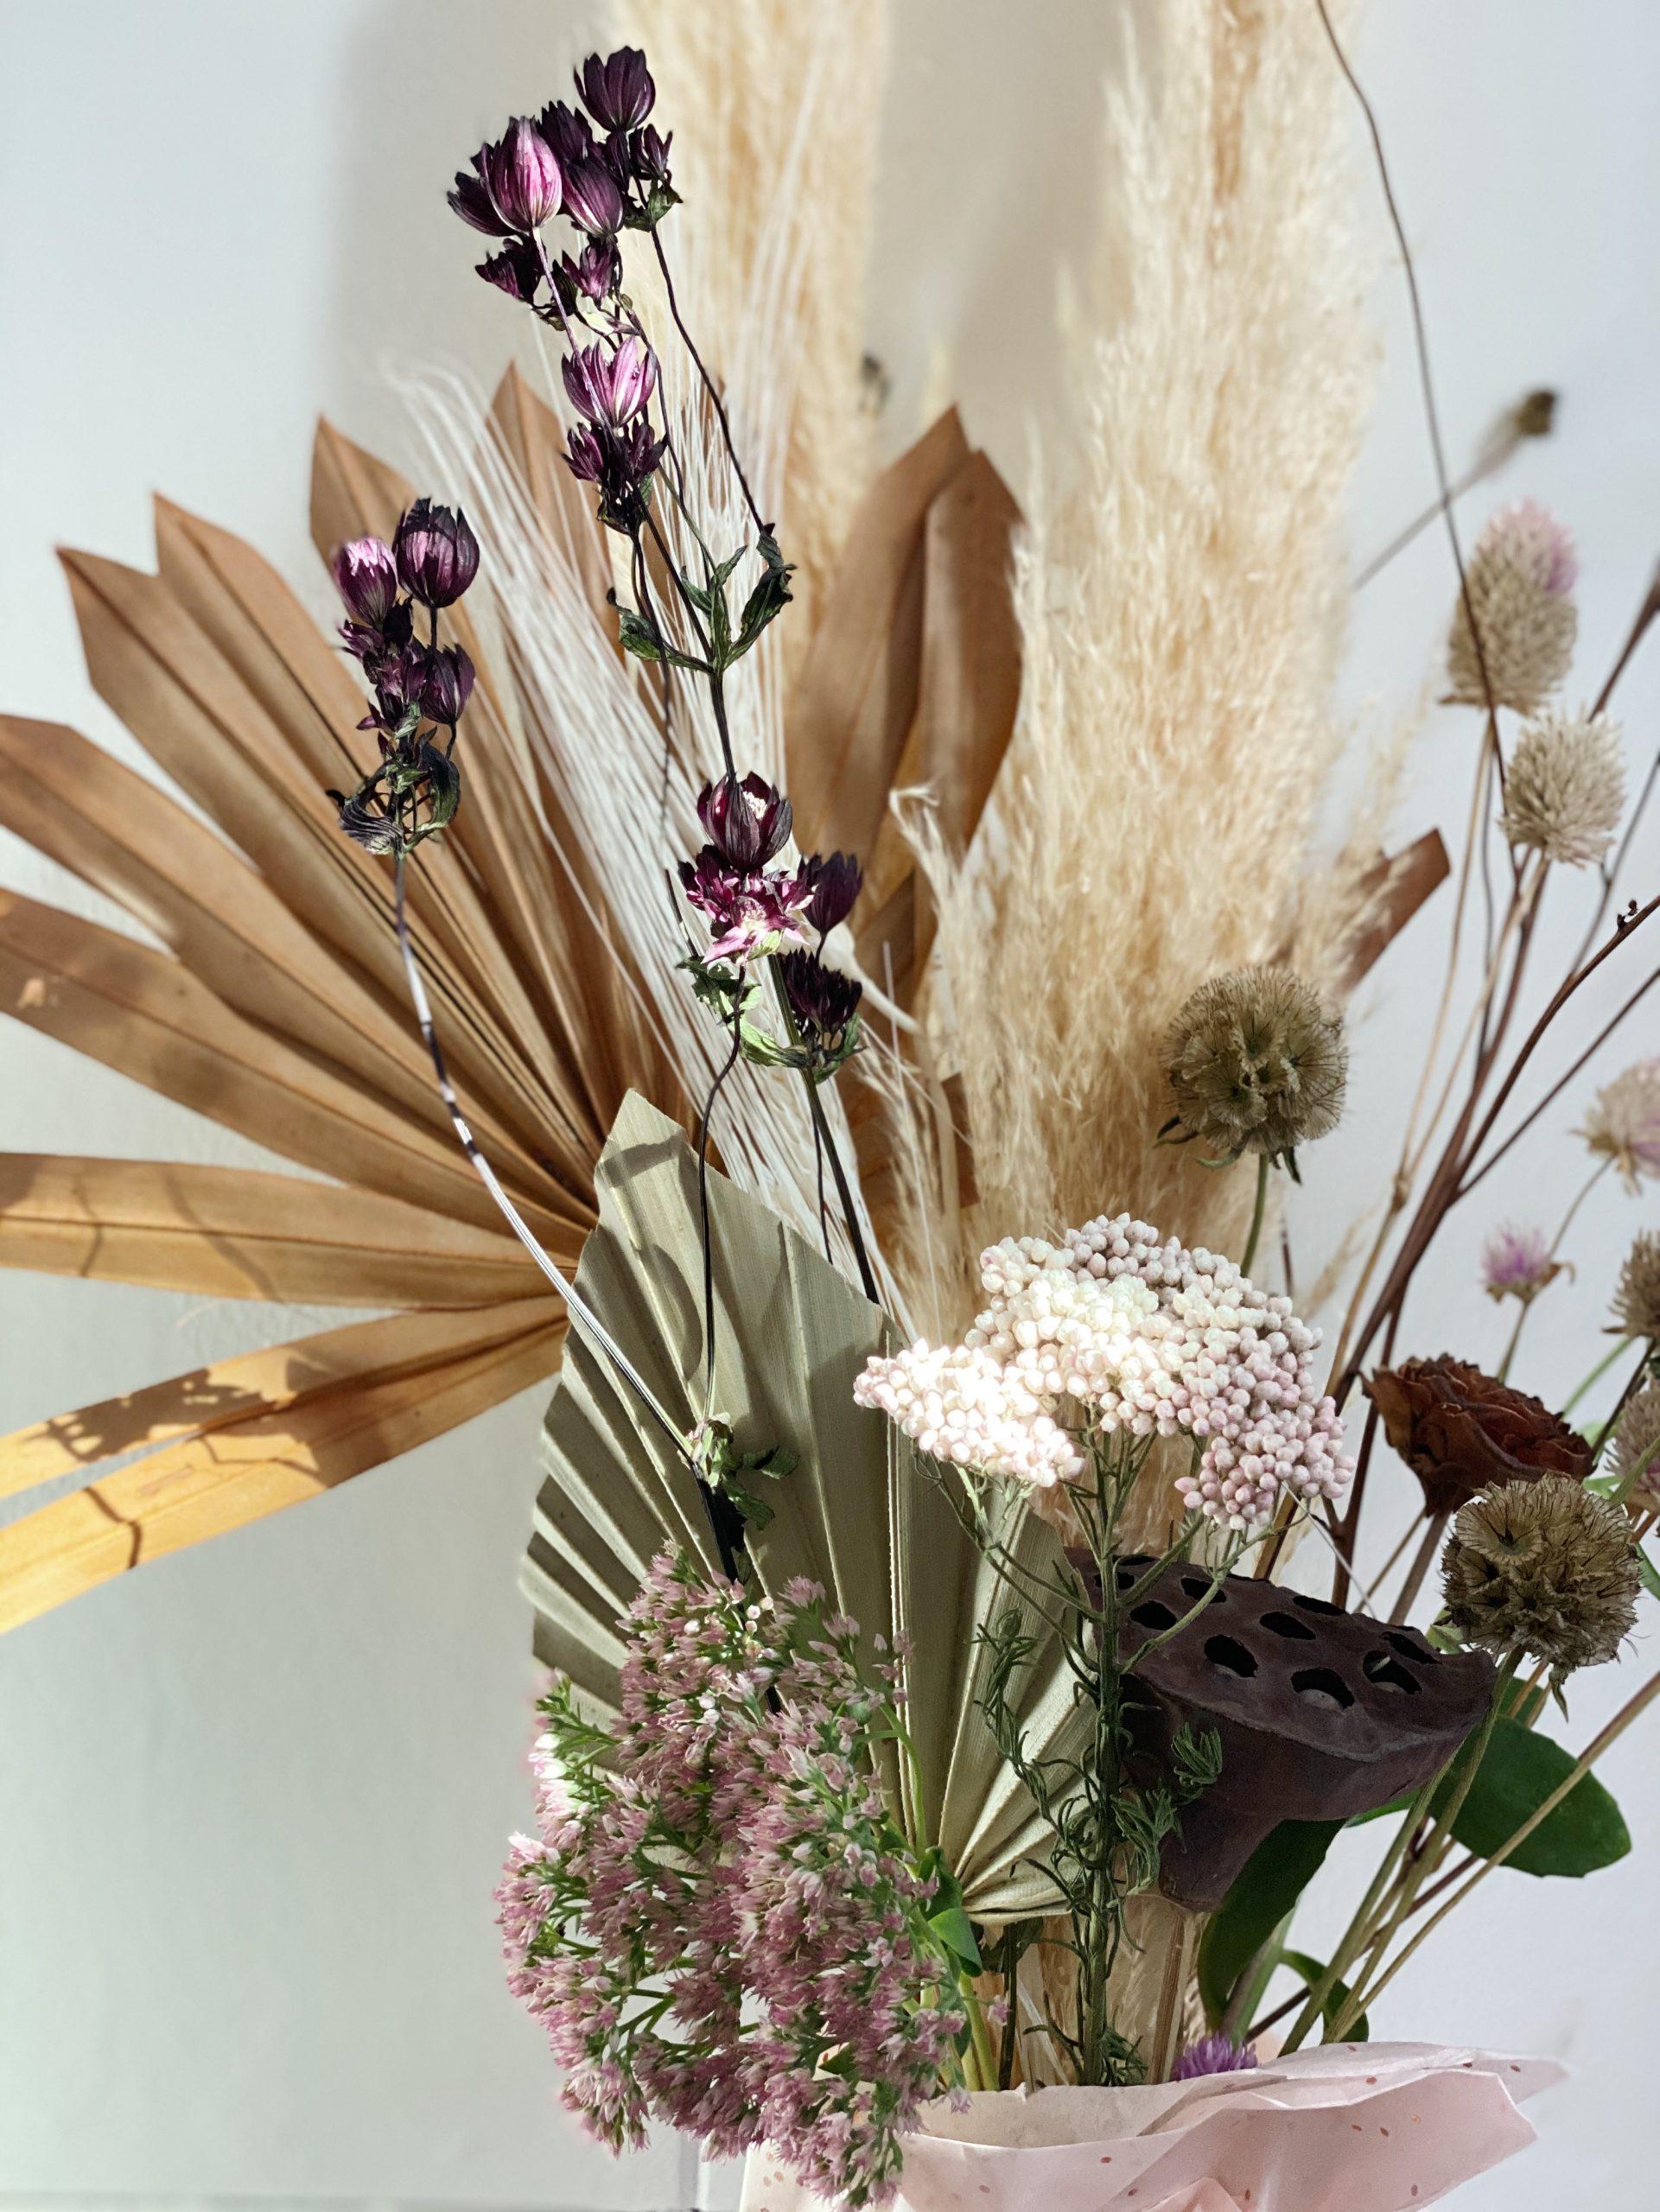 Medium Dried Floral Arrangement